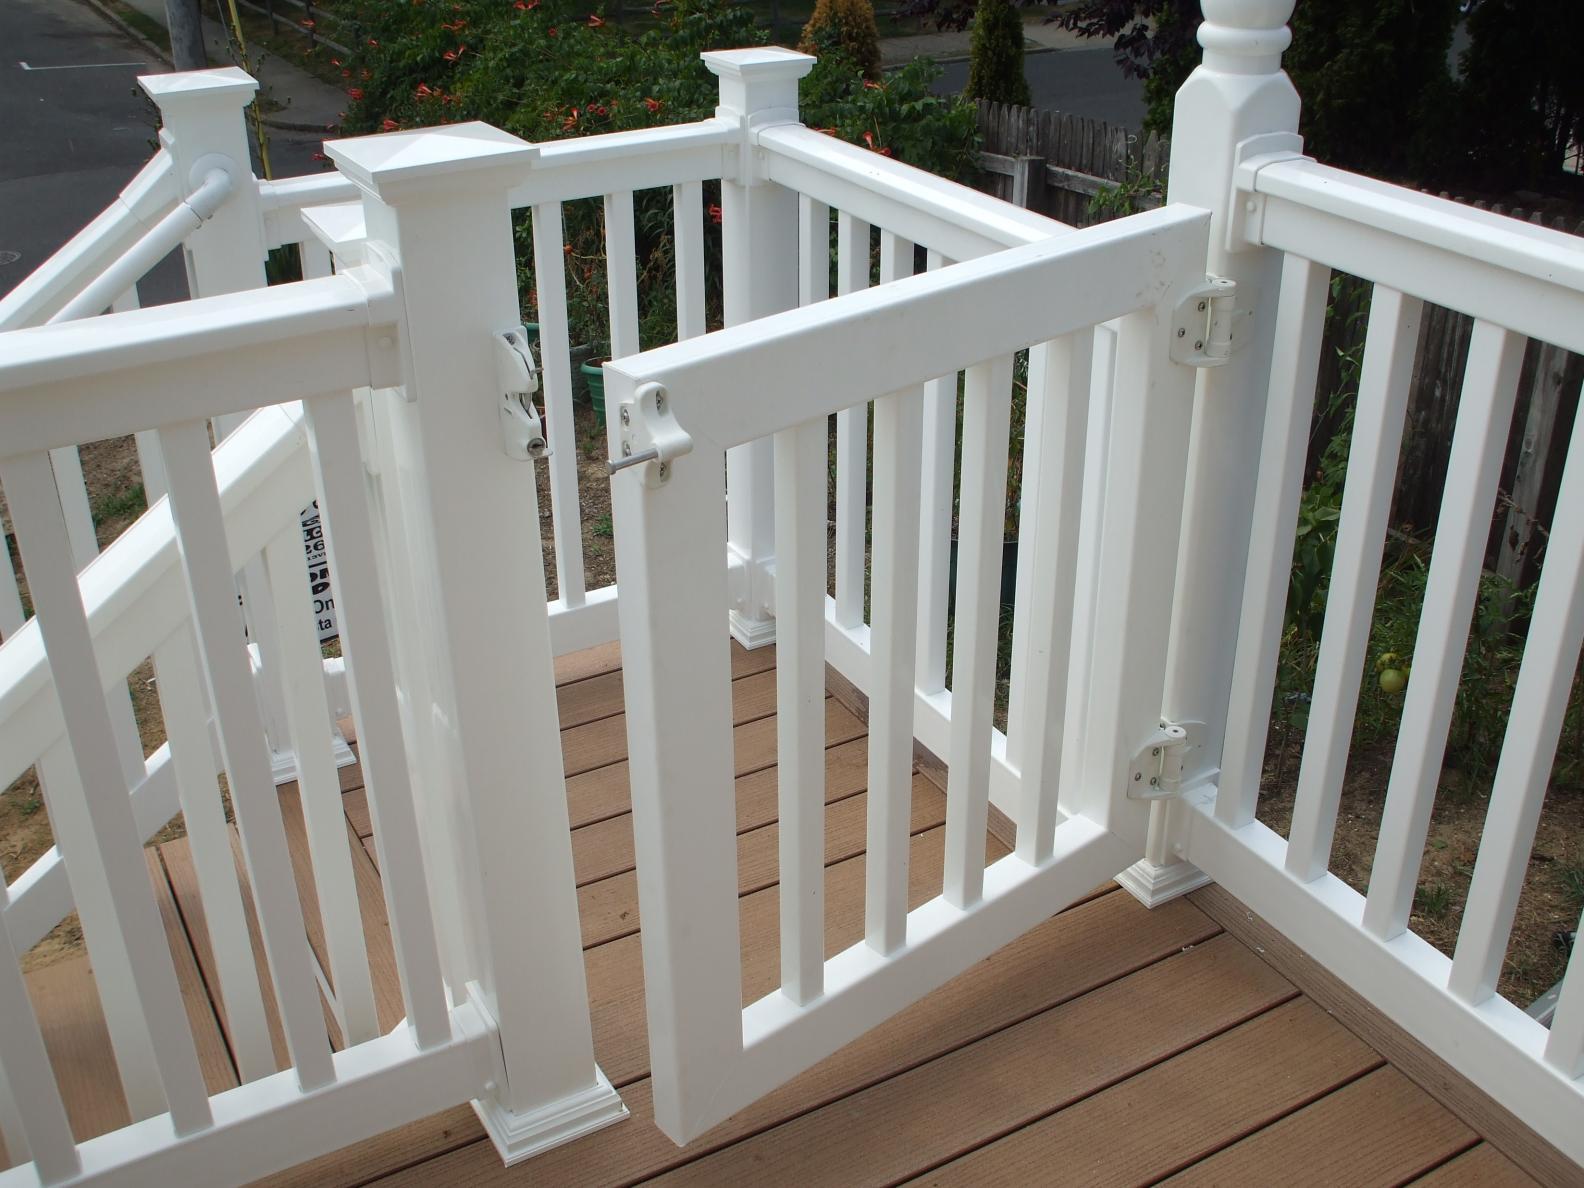 "36"" To 42"" Railing Modification Question - Decks & Fencing ..."